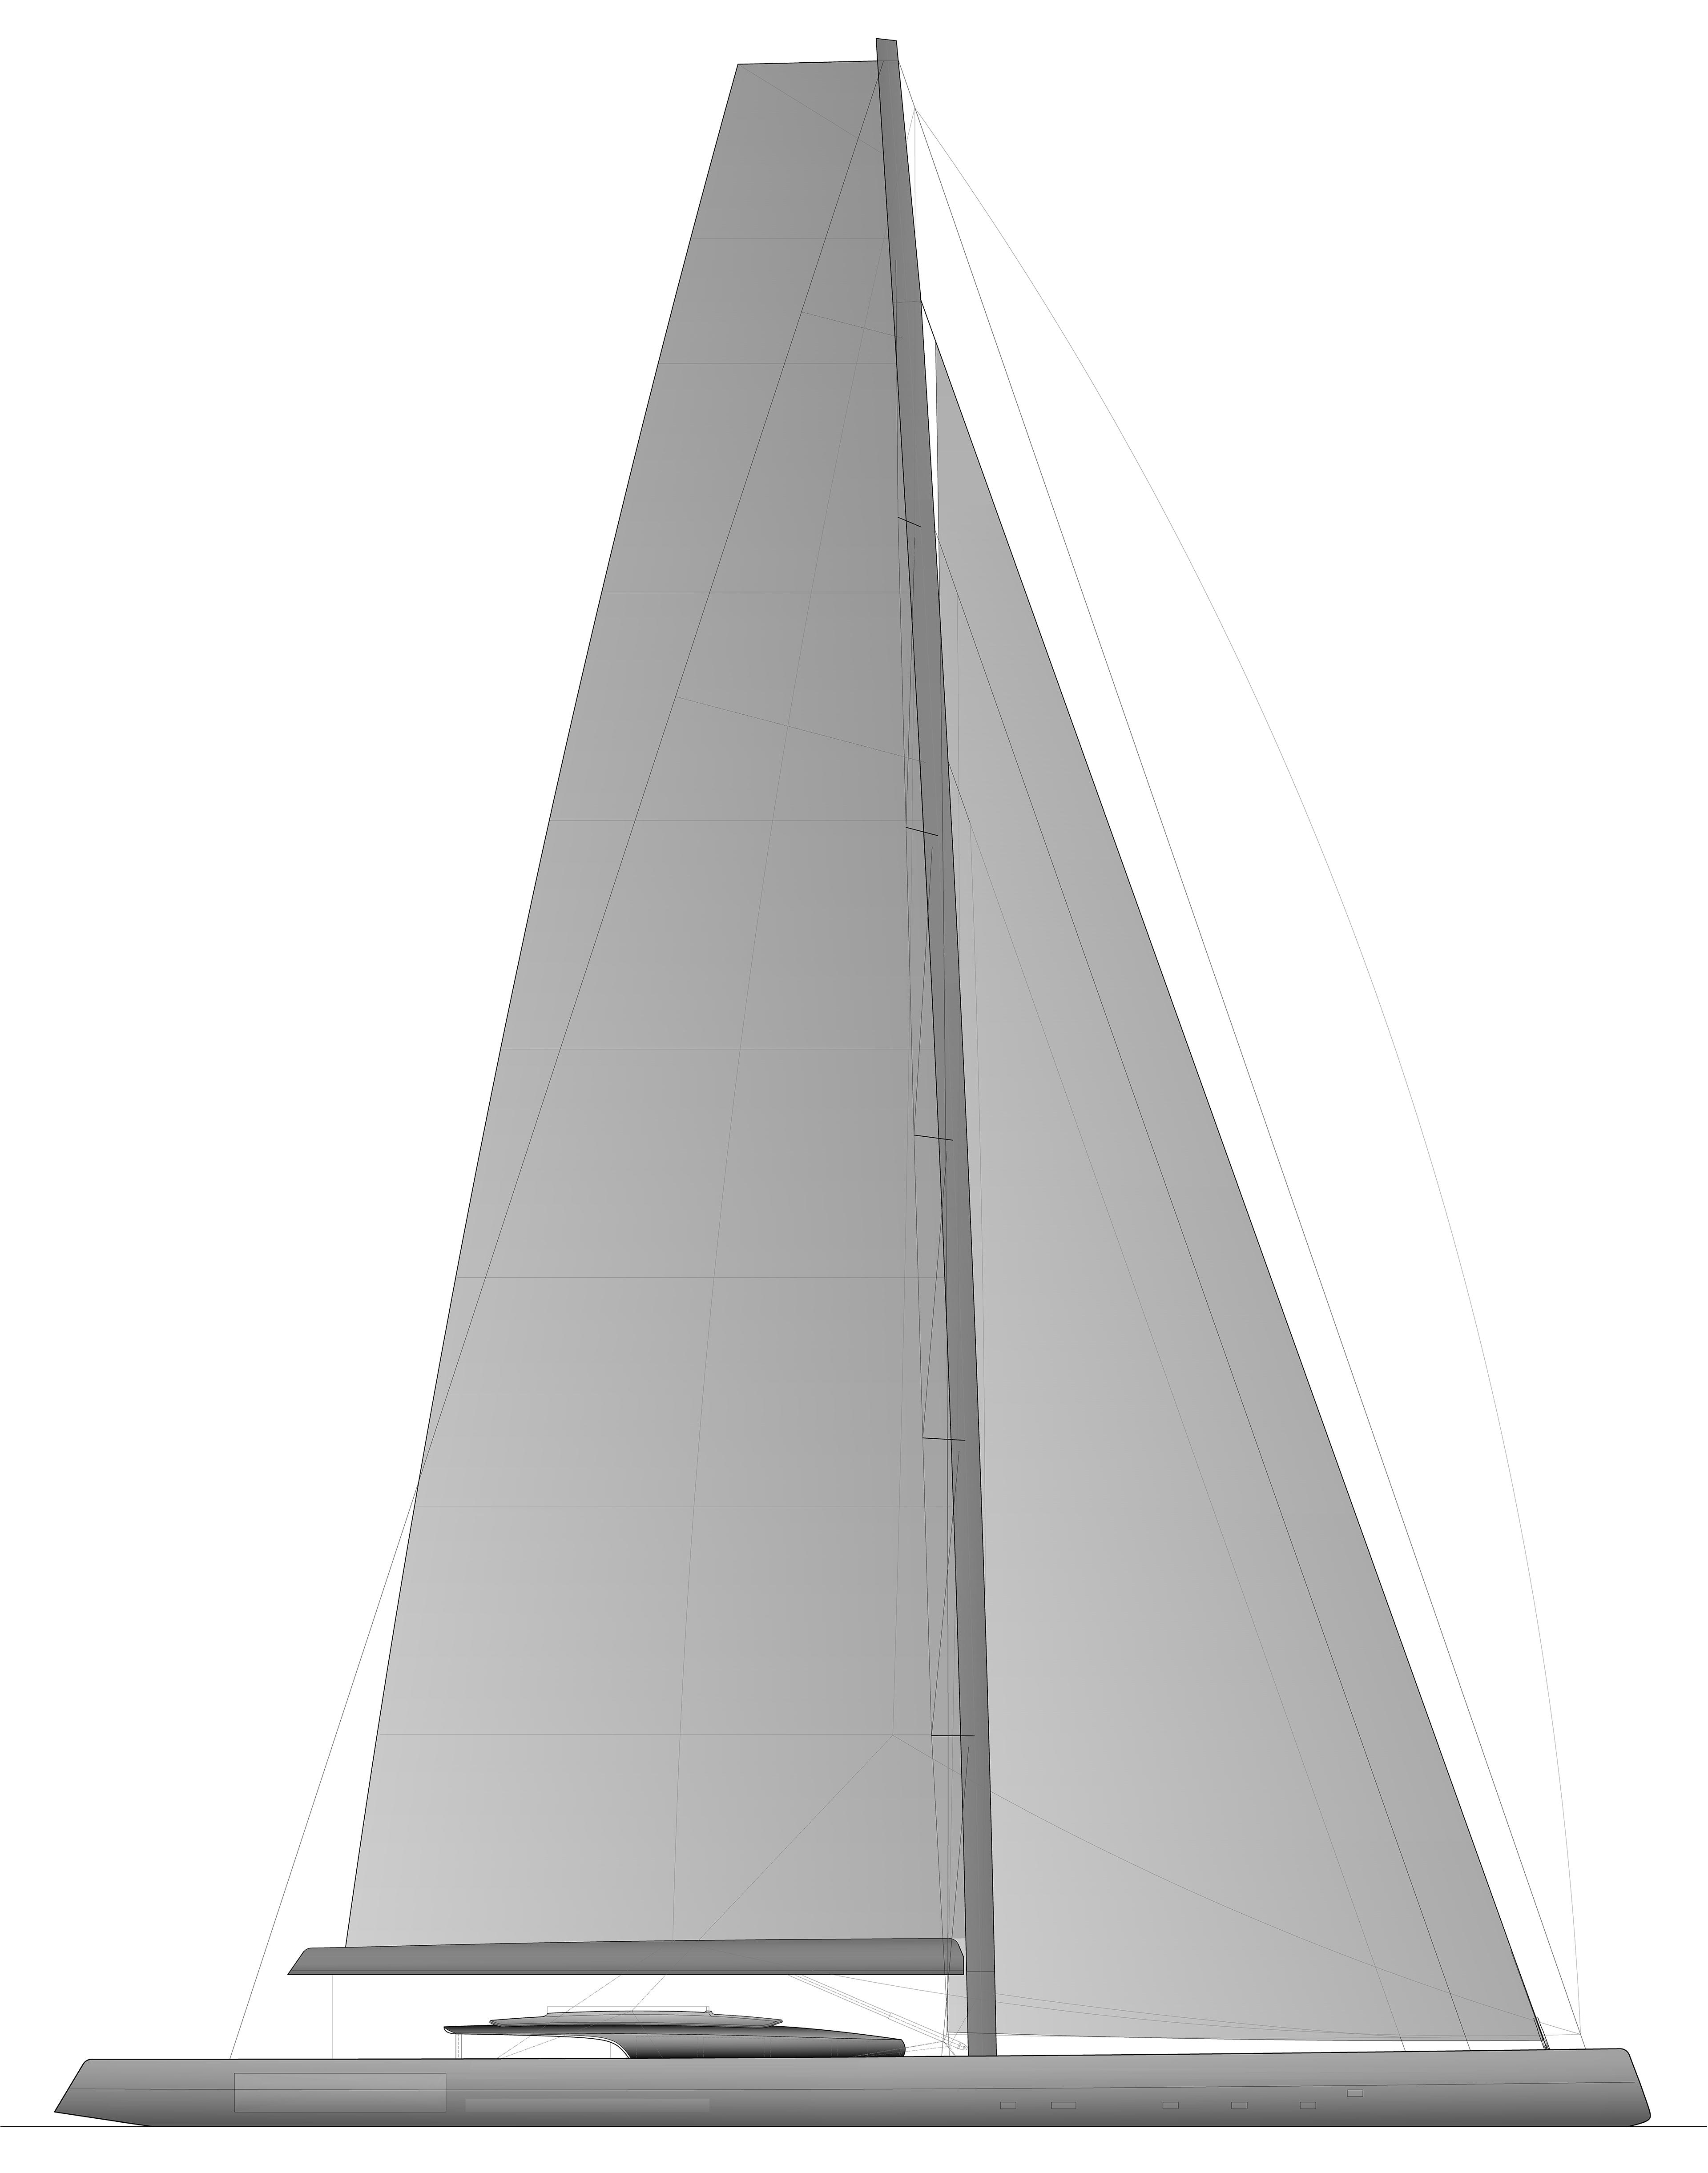 MMYD_055_72.5m_A_Sail Plan_C+.png